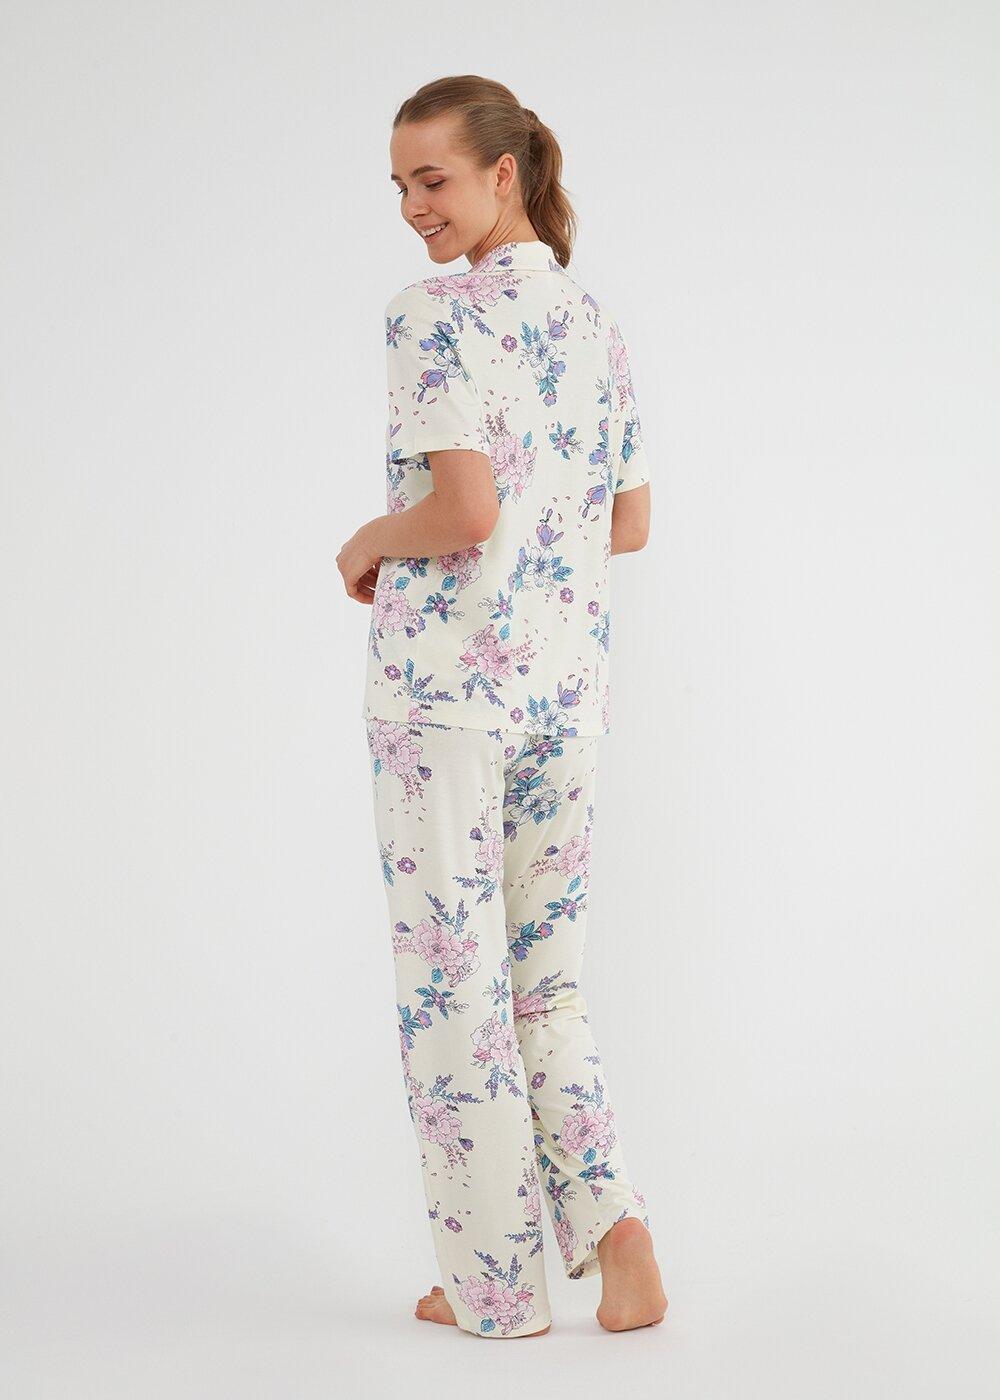 resm Sunny Maskulen Pijama Takımı - SARI DESENLİ